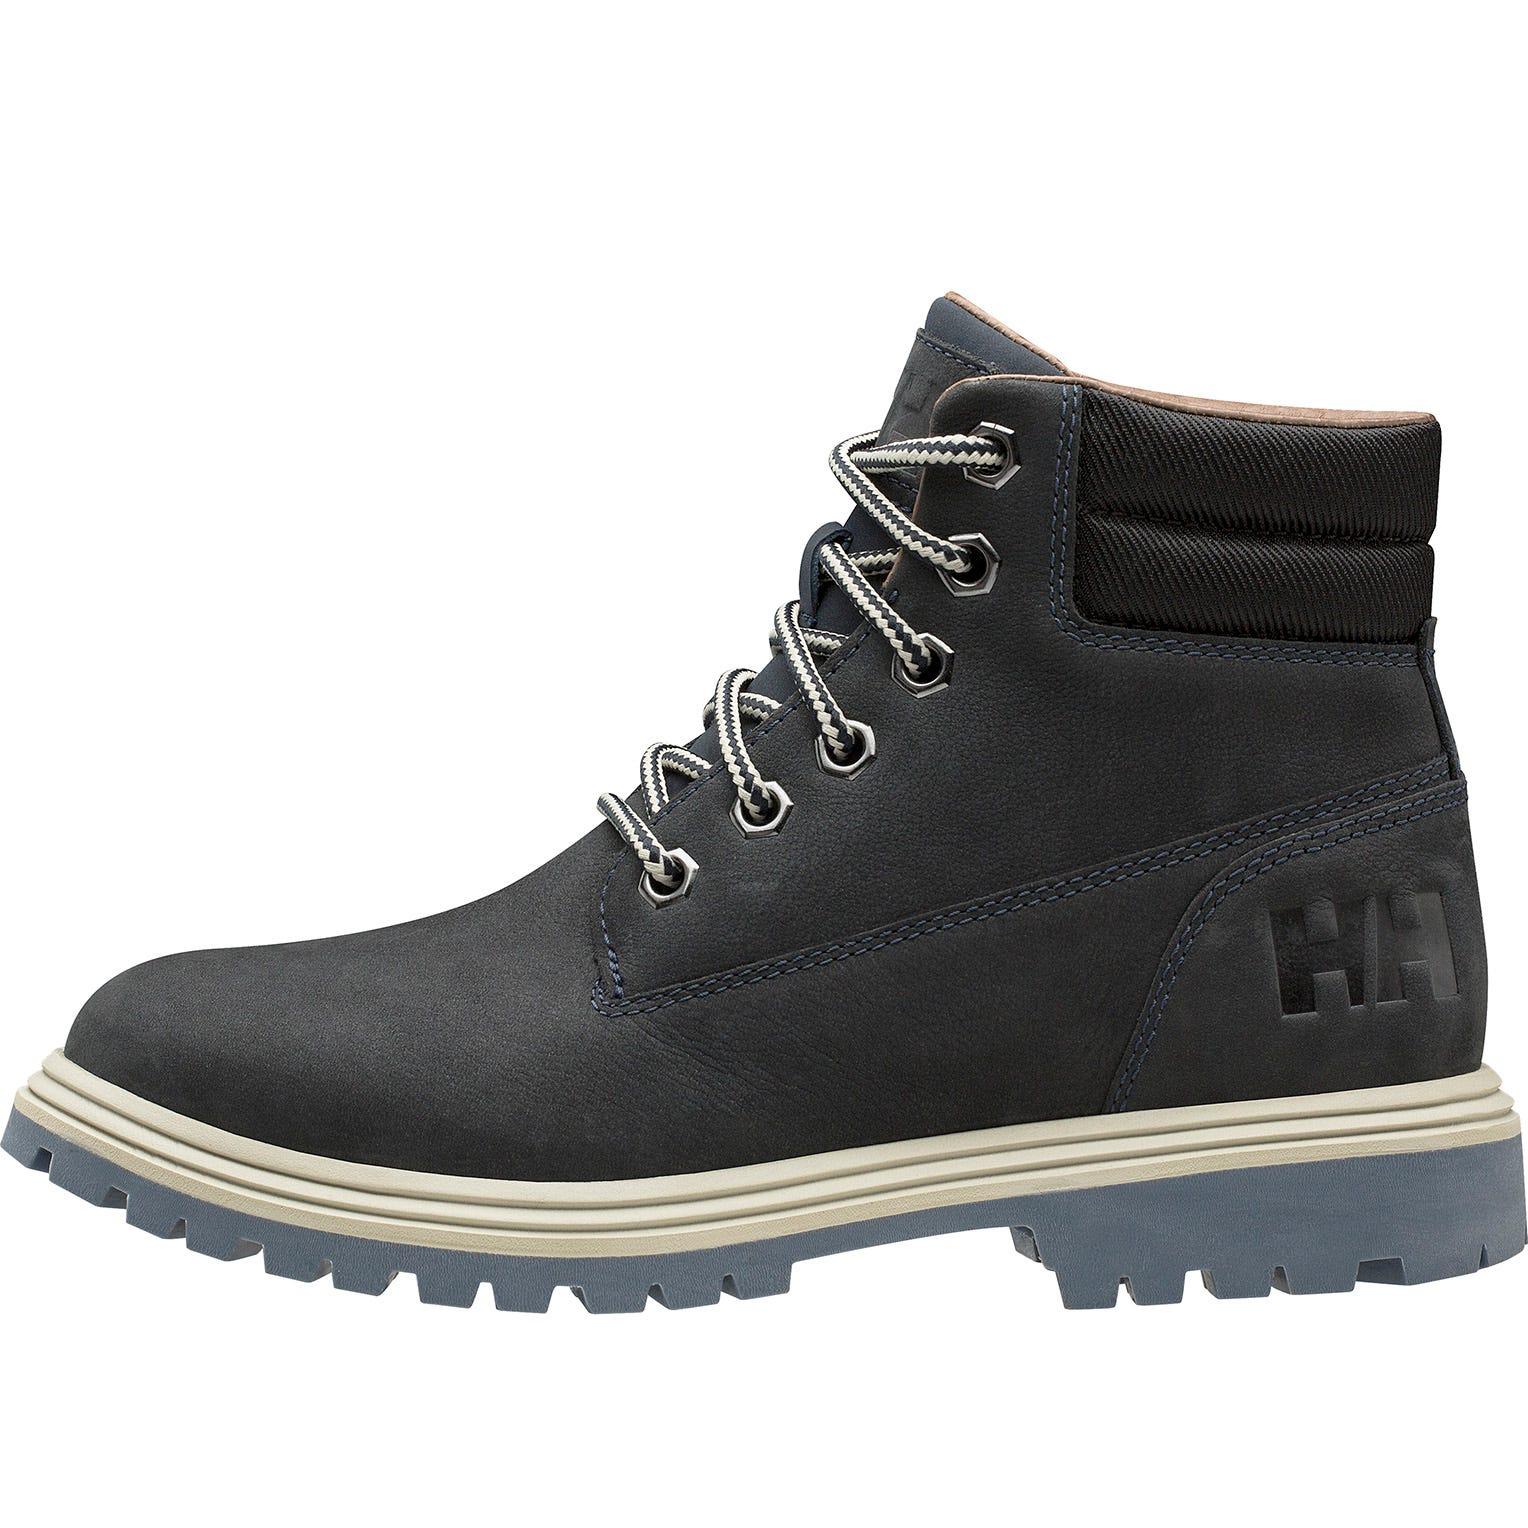 Helly Hansen W Fremont Womens Casual Shoe Navy 37.5/6.5